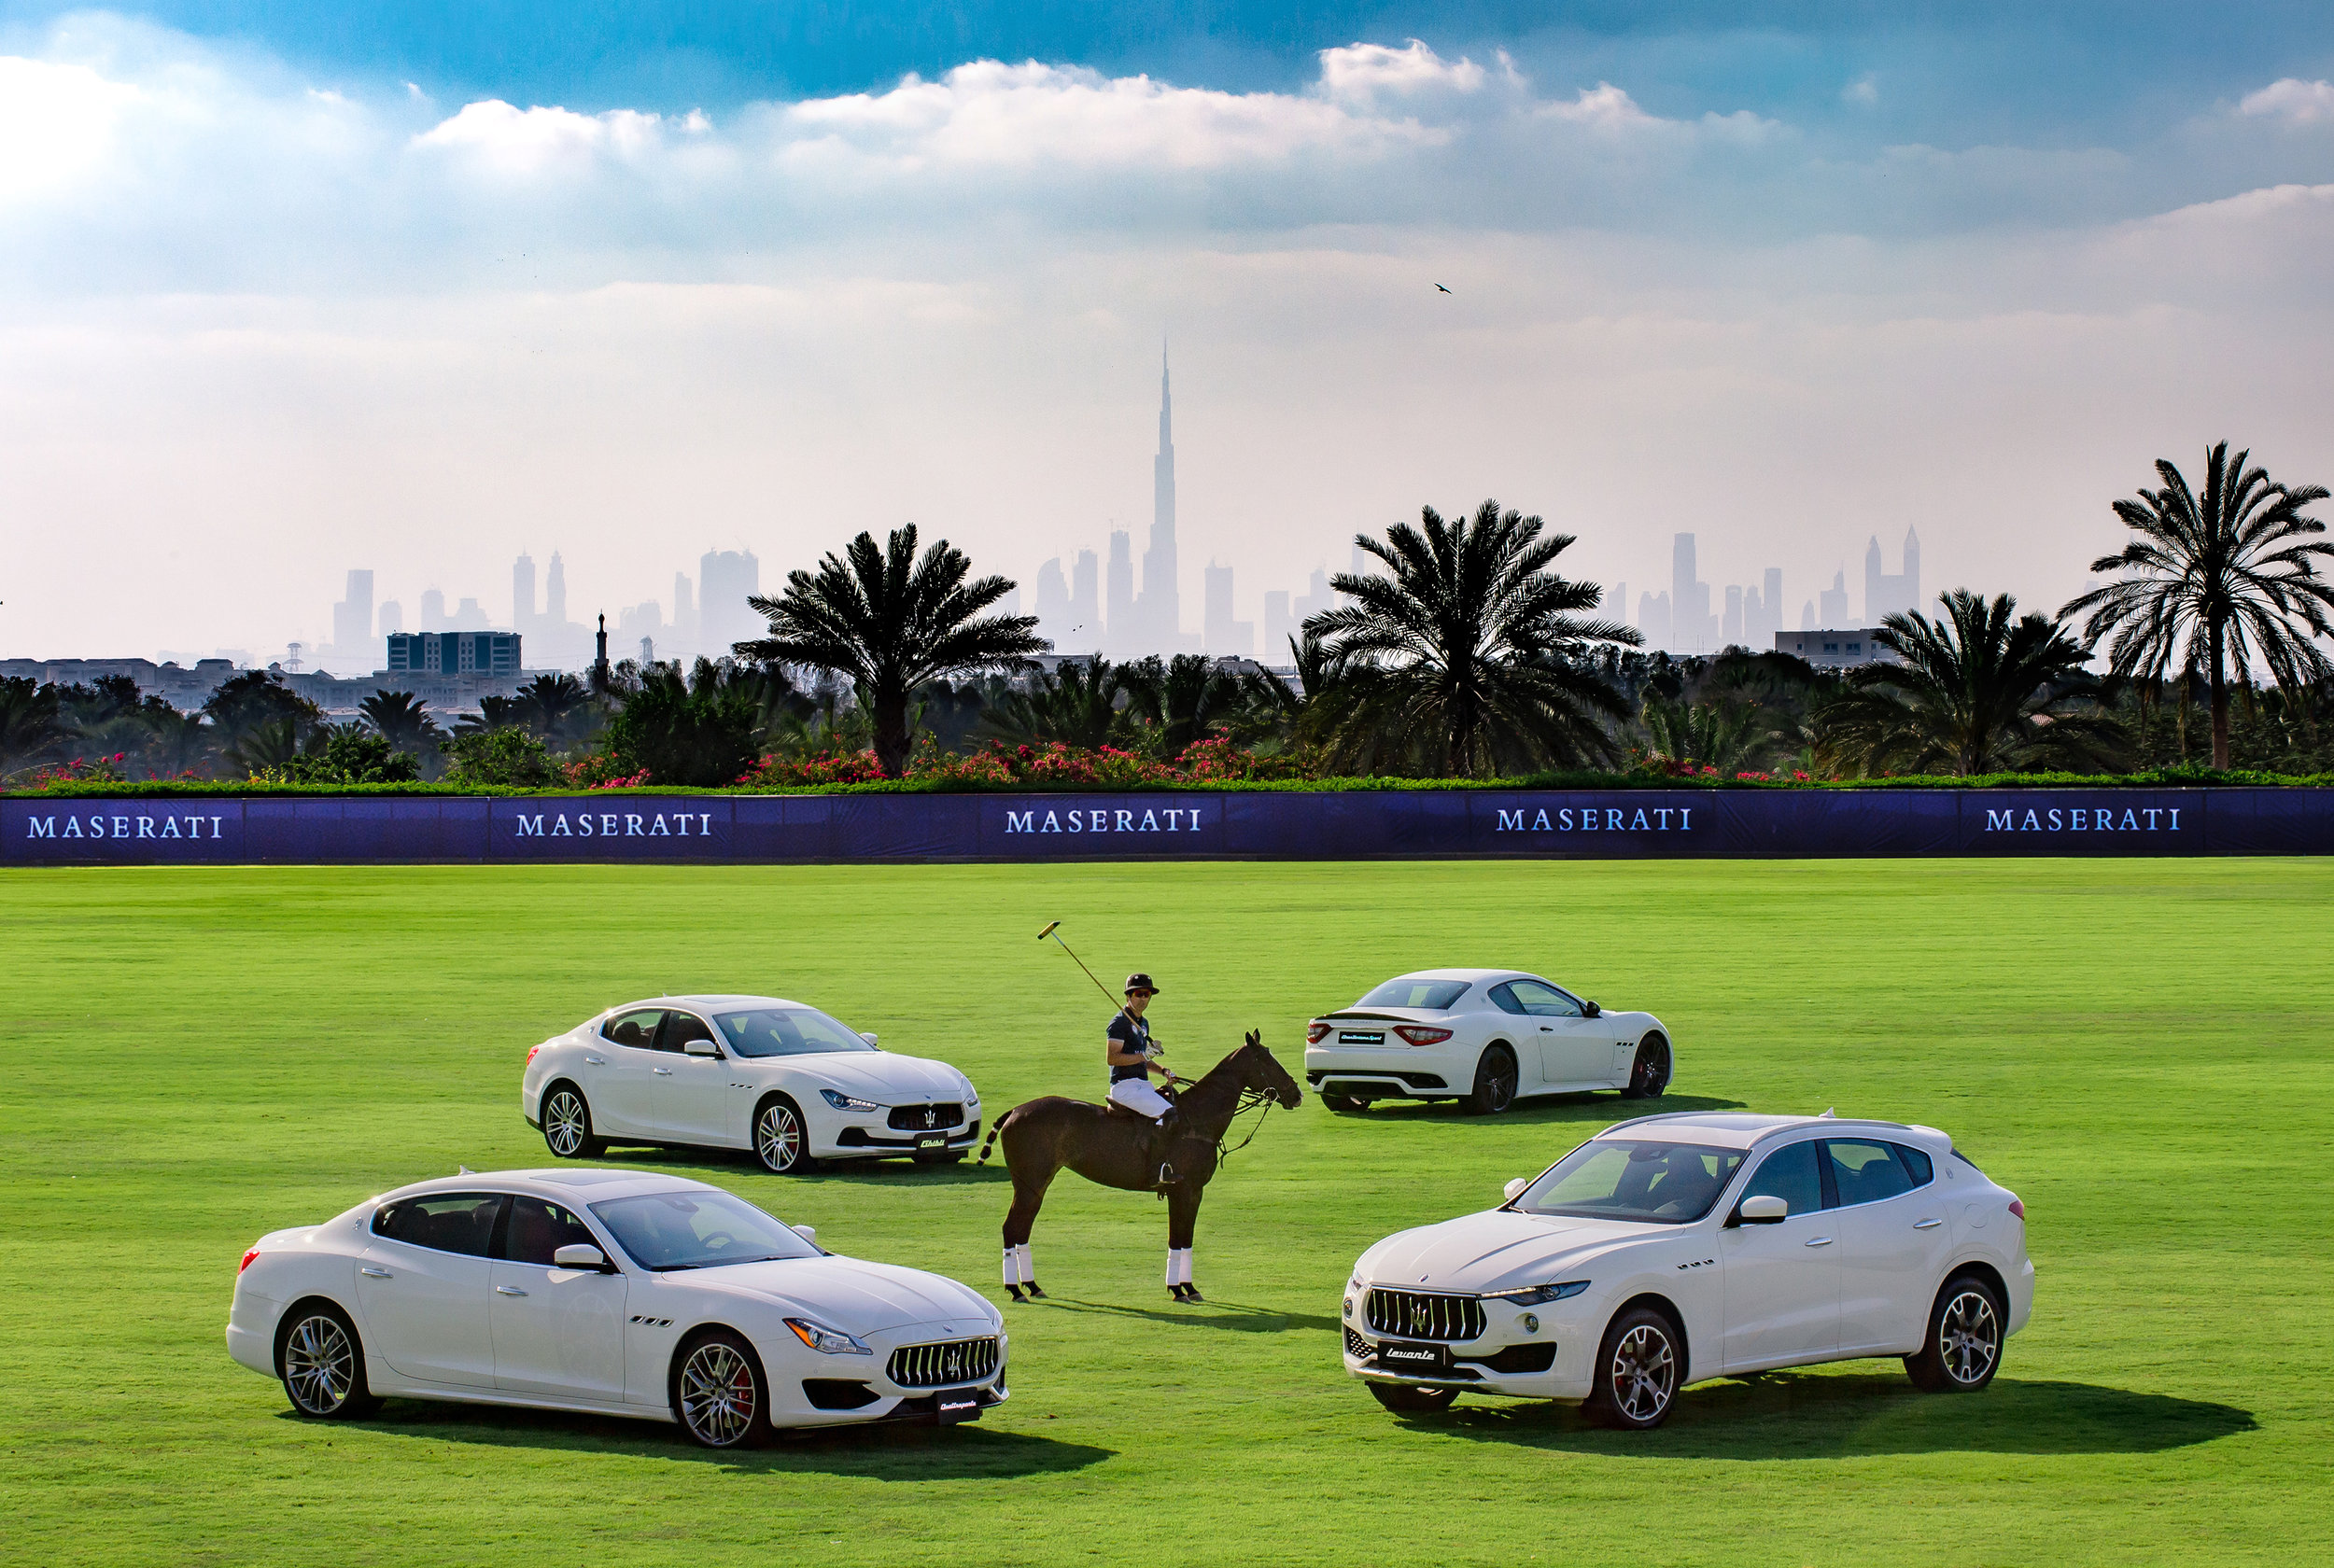 Maserati 2017 Polo Tour's 2nd Leg in Abu Dhabi